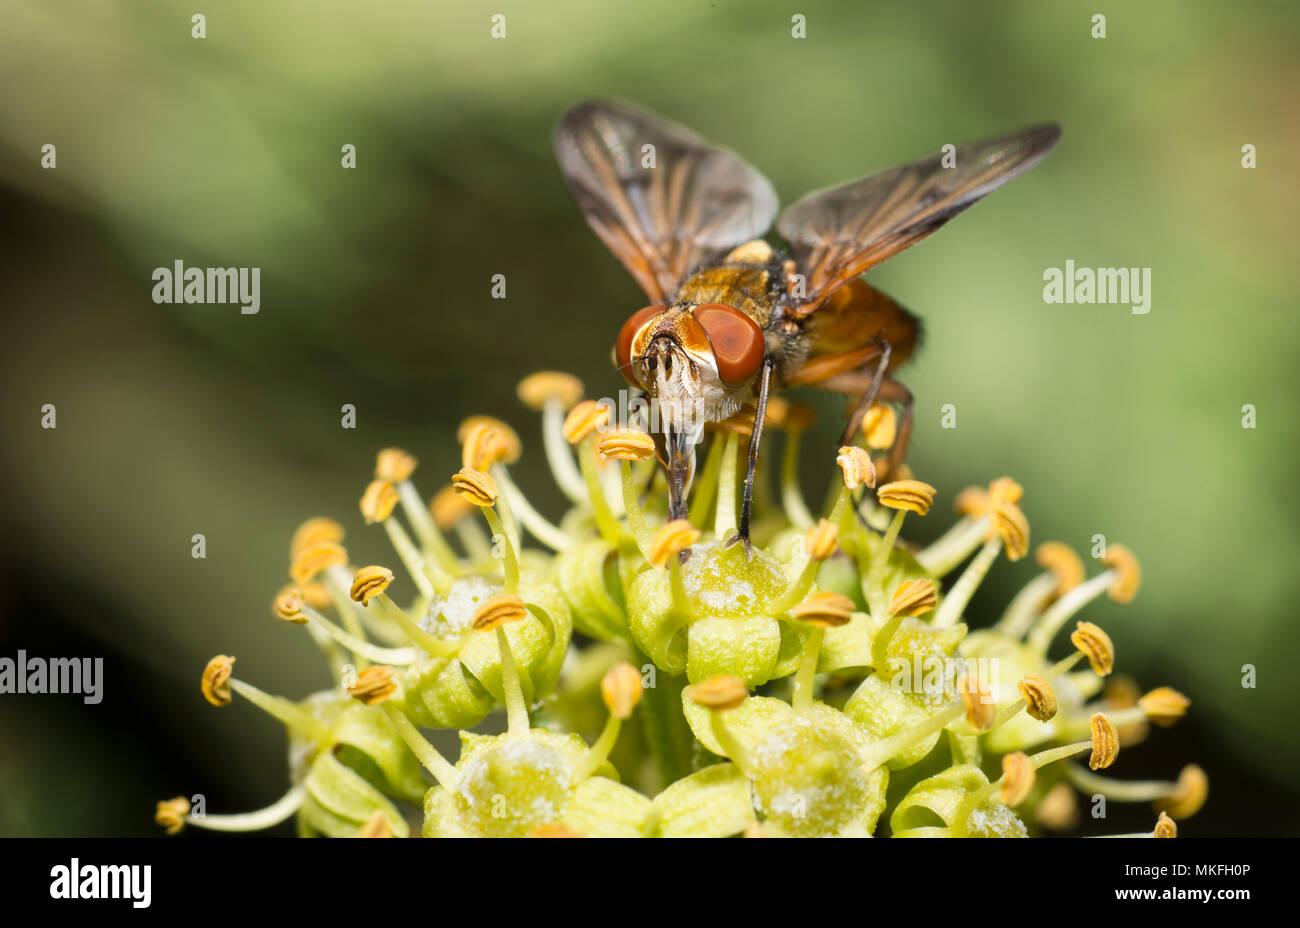 Hoverfly (Phasia hemiptera) licking nectar of ivy, Mont Ventoux, France Stock Photo